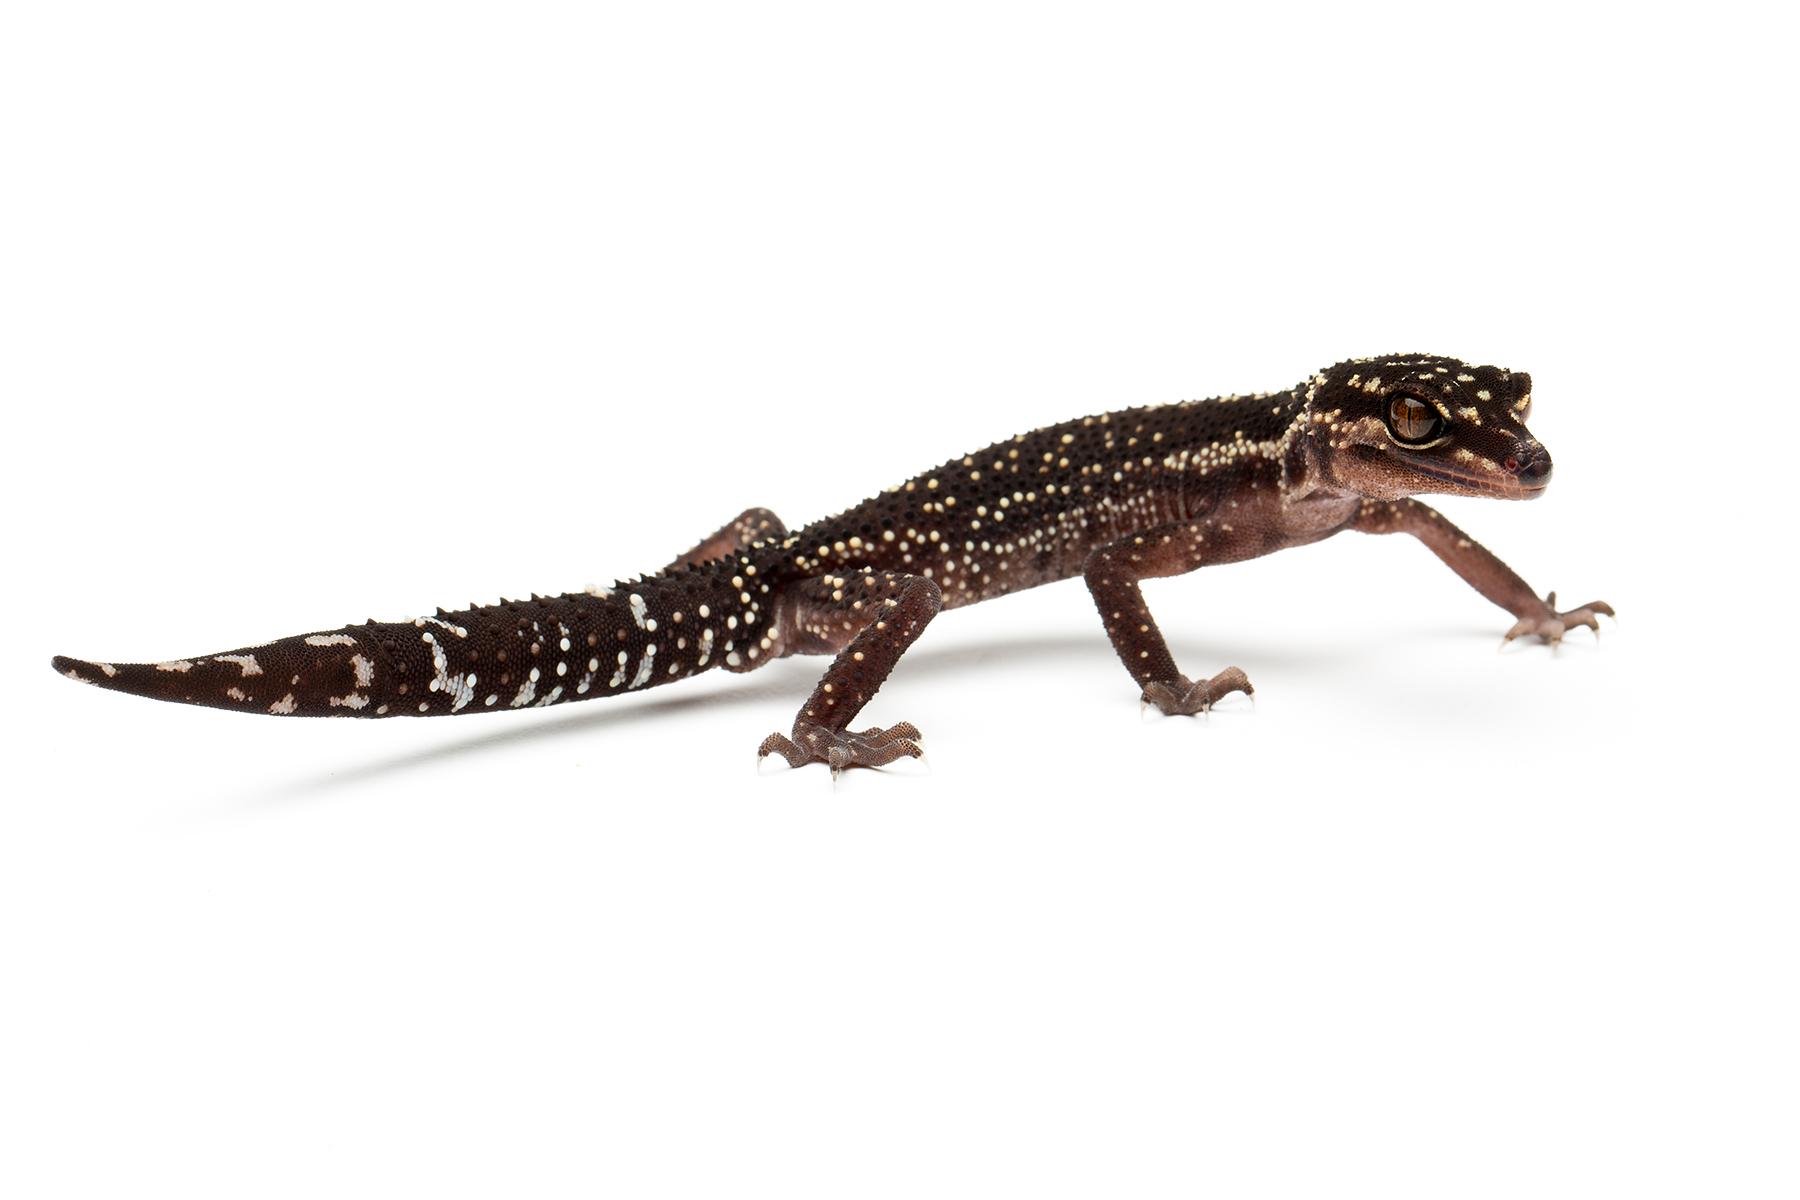 Adult male G. kuroiwae